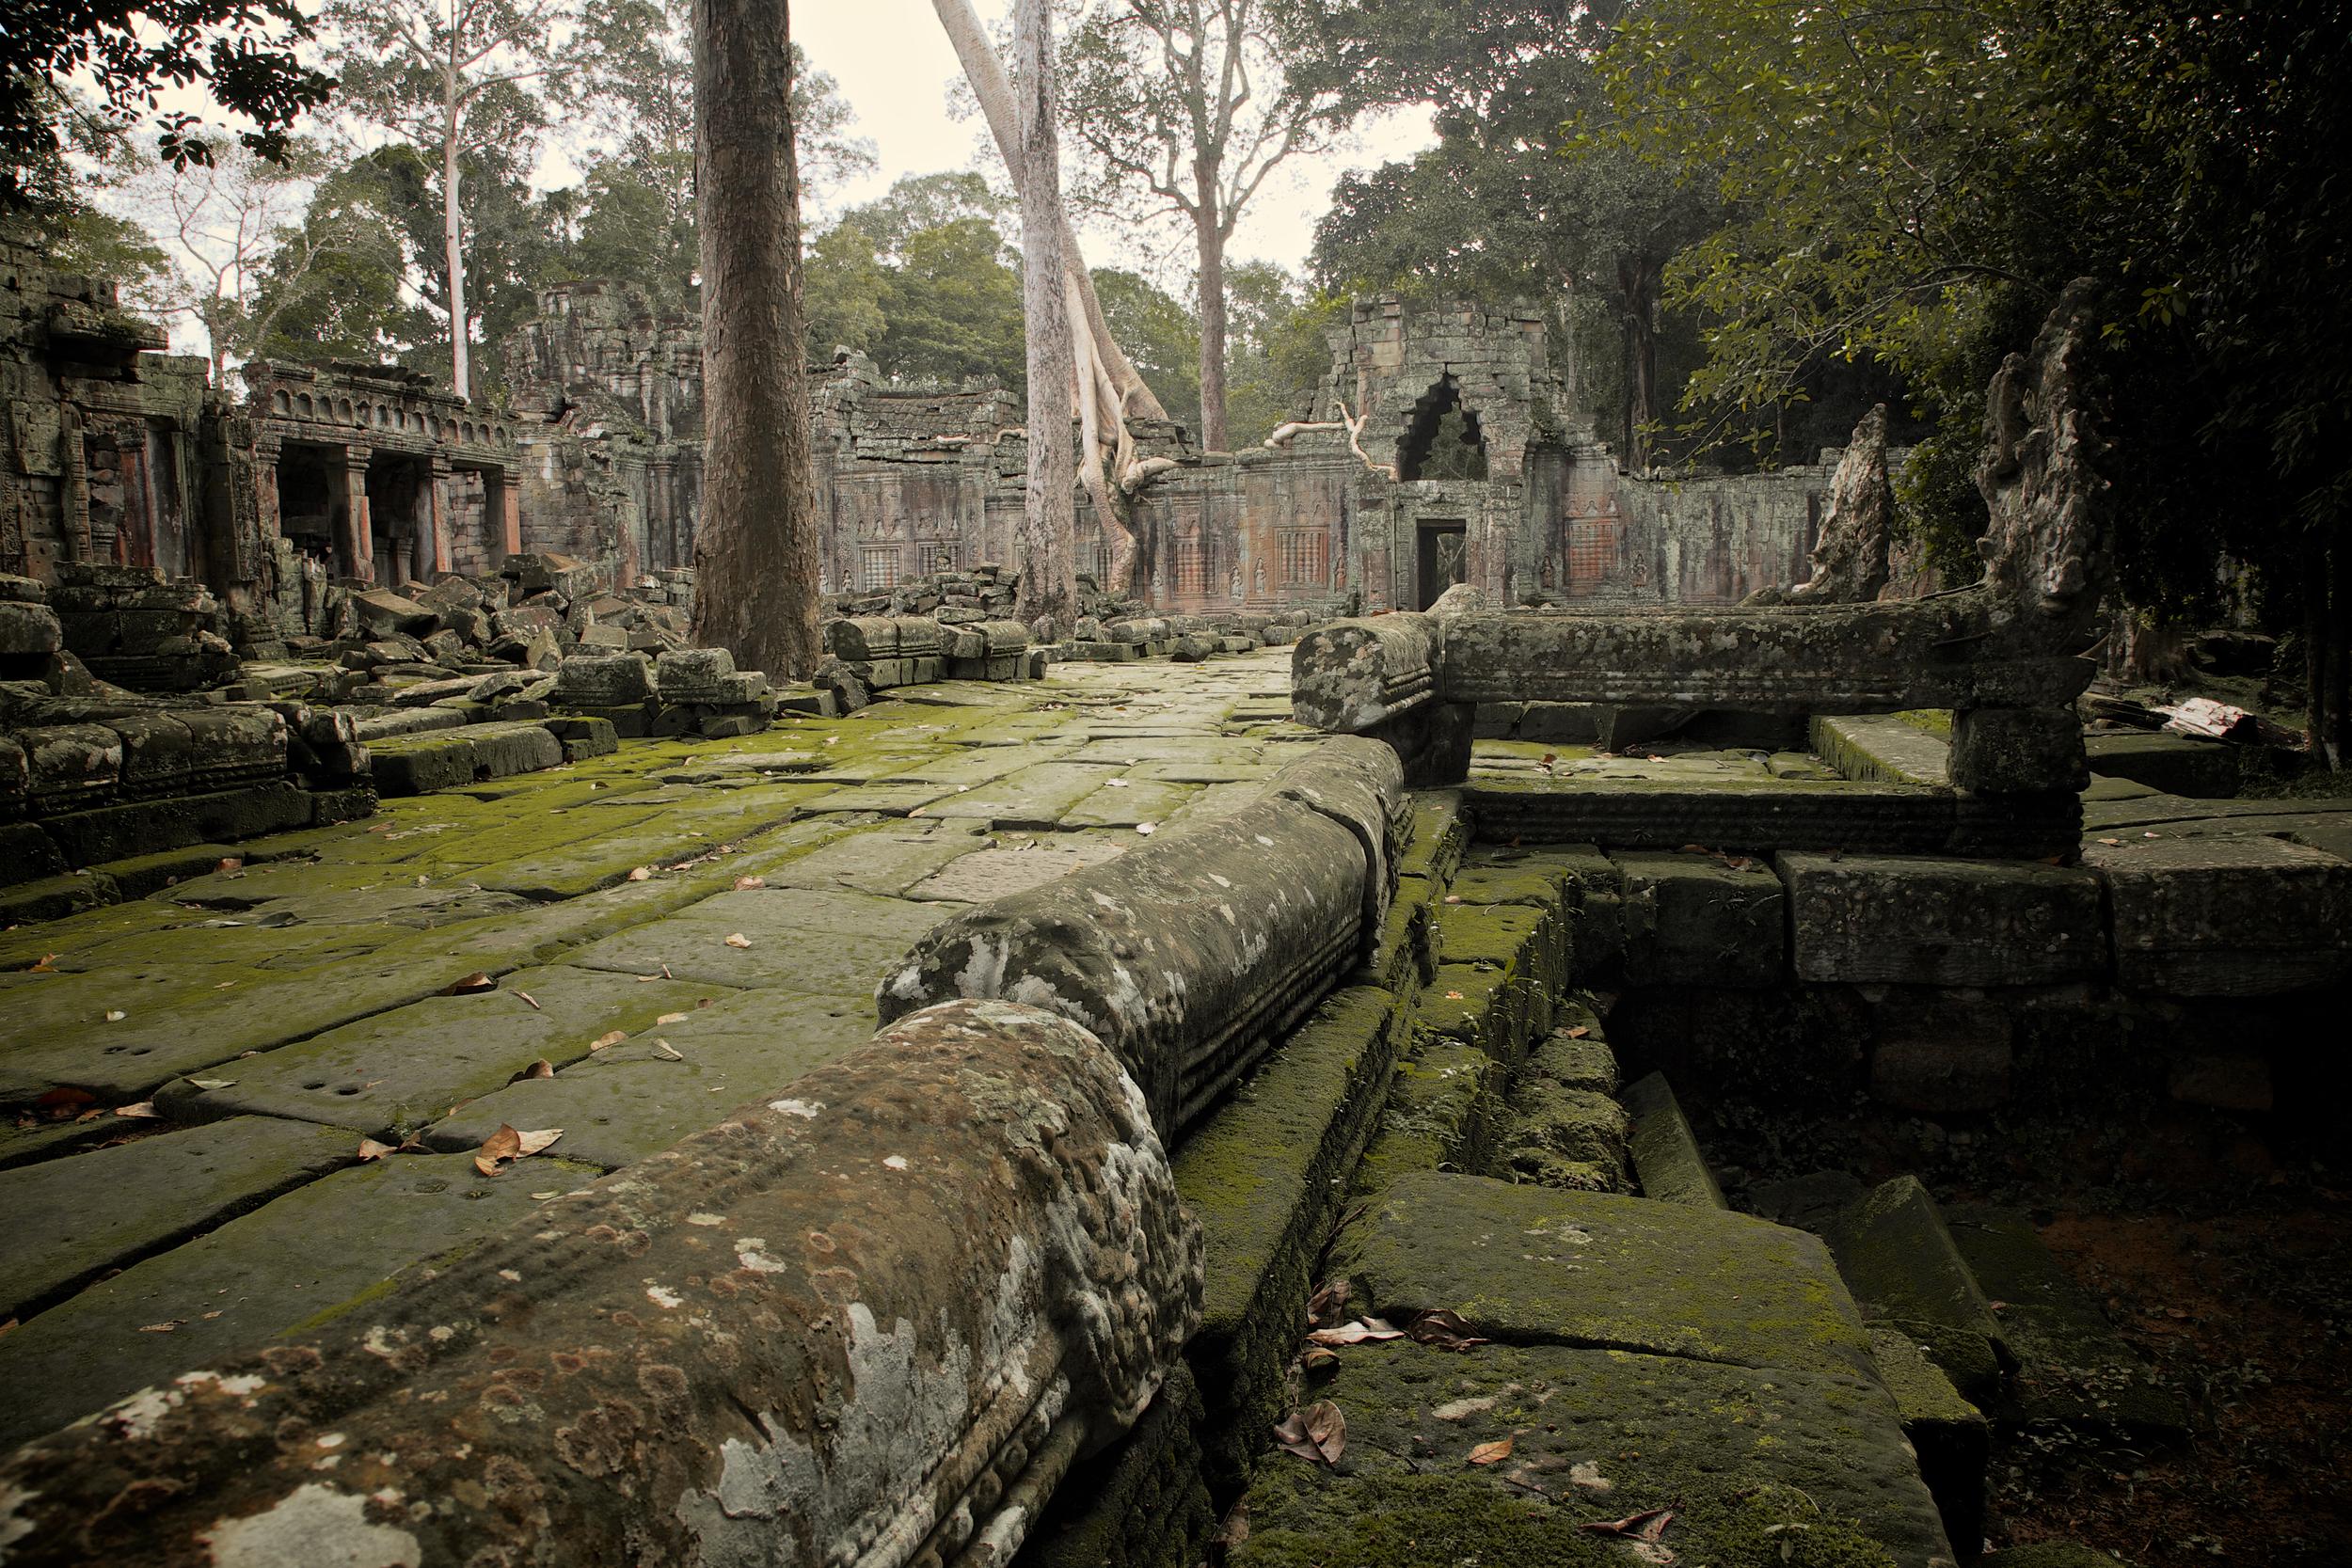 cambodia_IVB_11.jpg